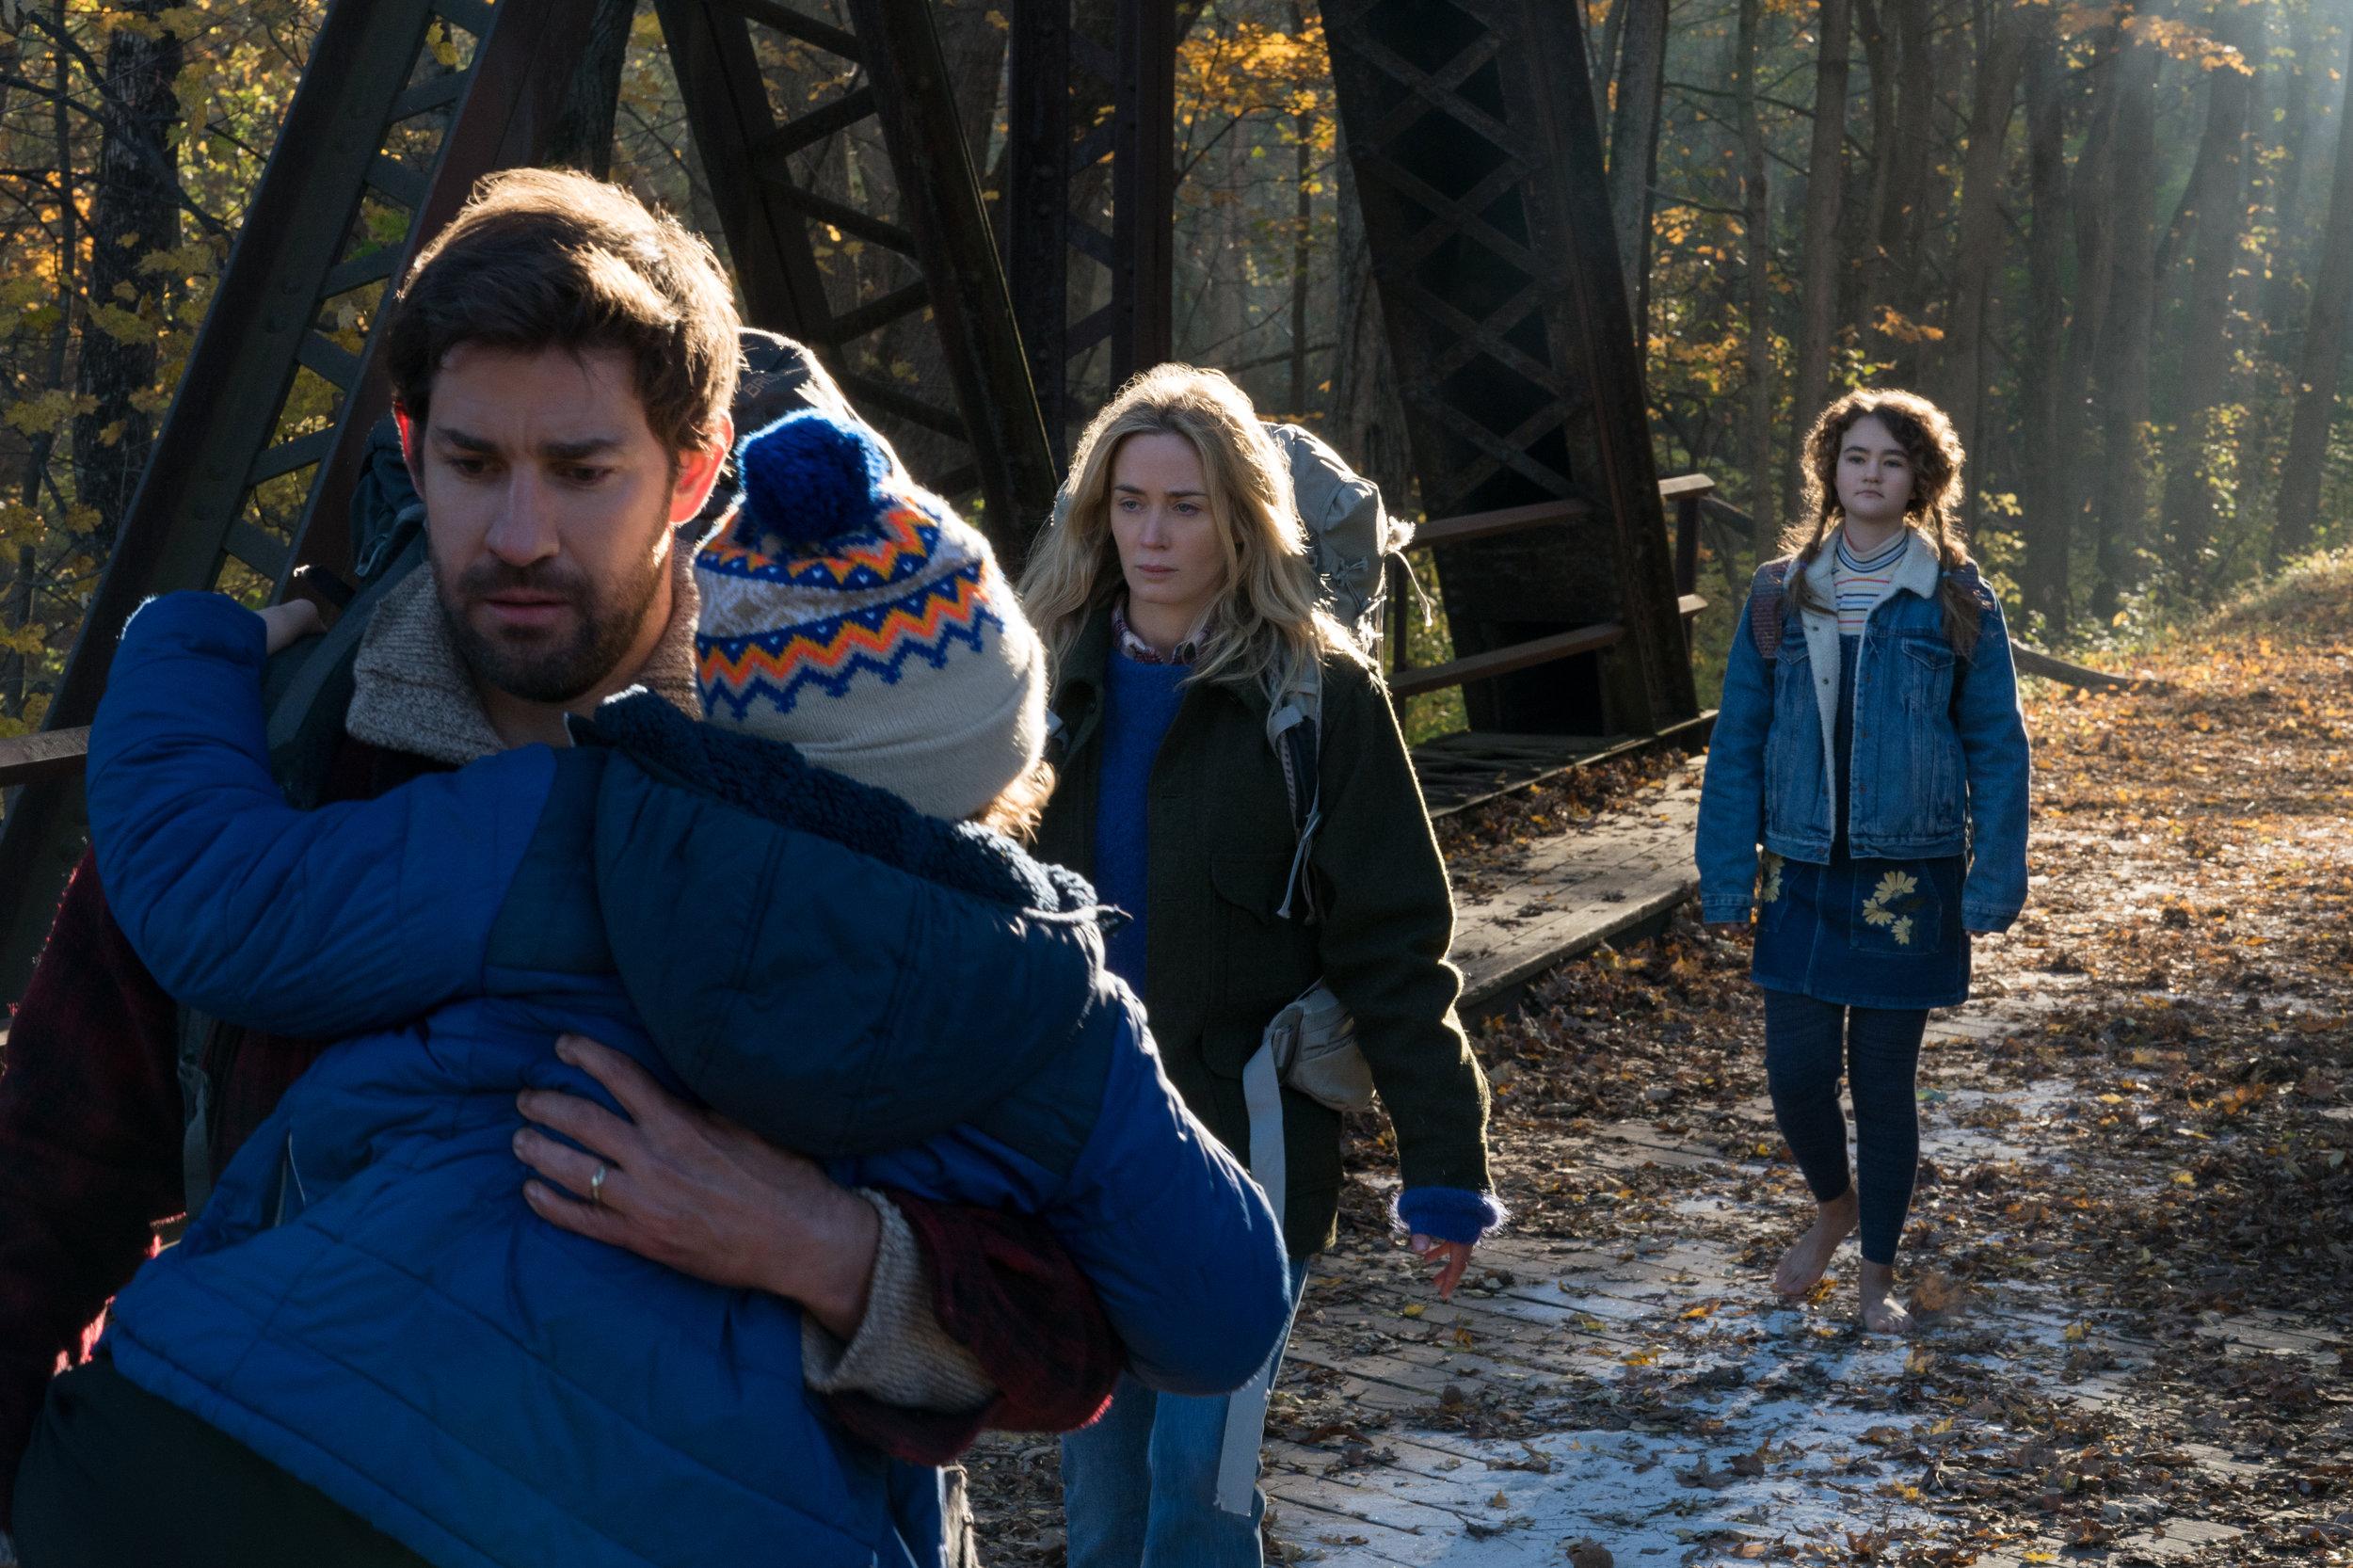 The quietest family you've ever met: John Krasinski, Emily Blunt and Millicent Simmons